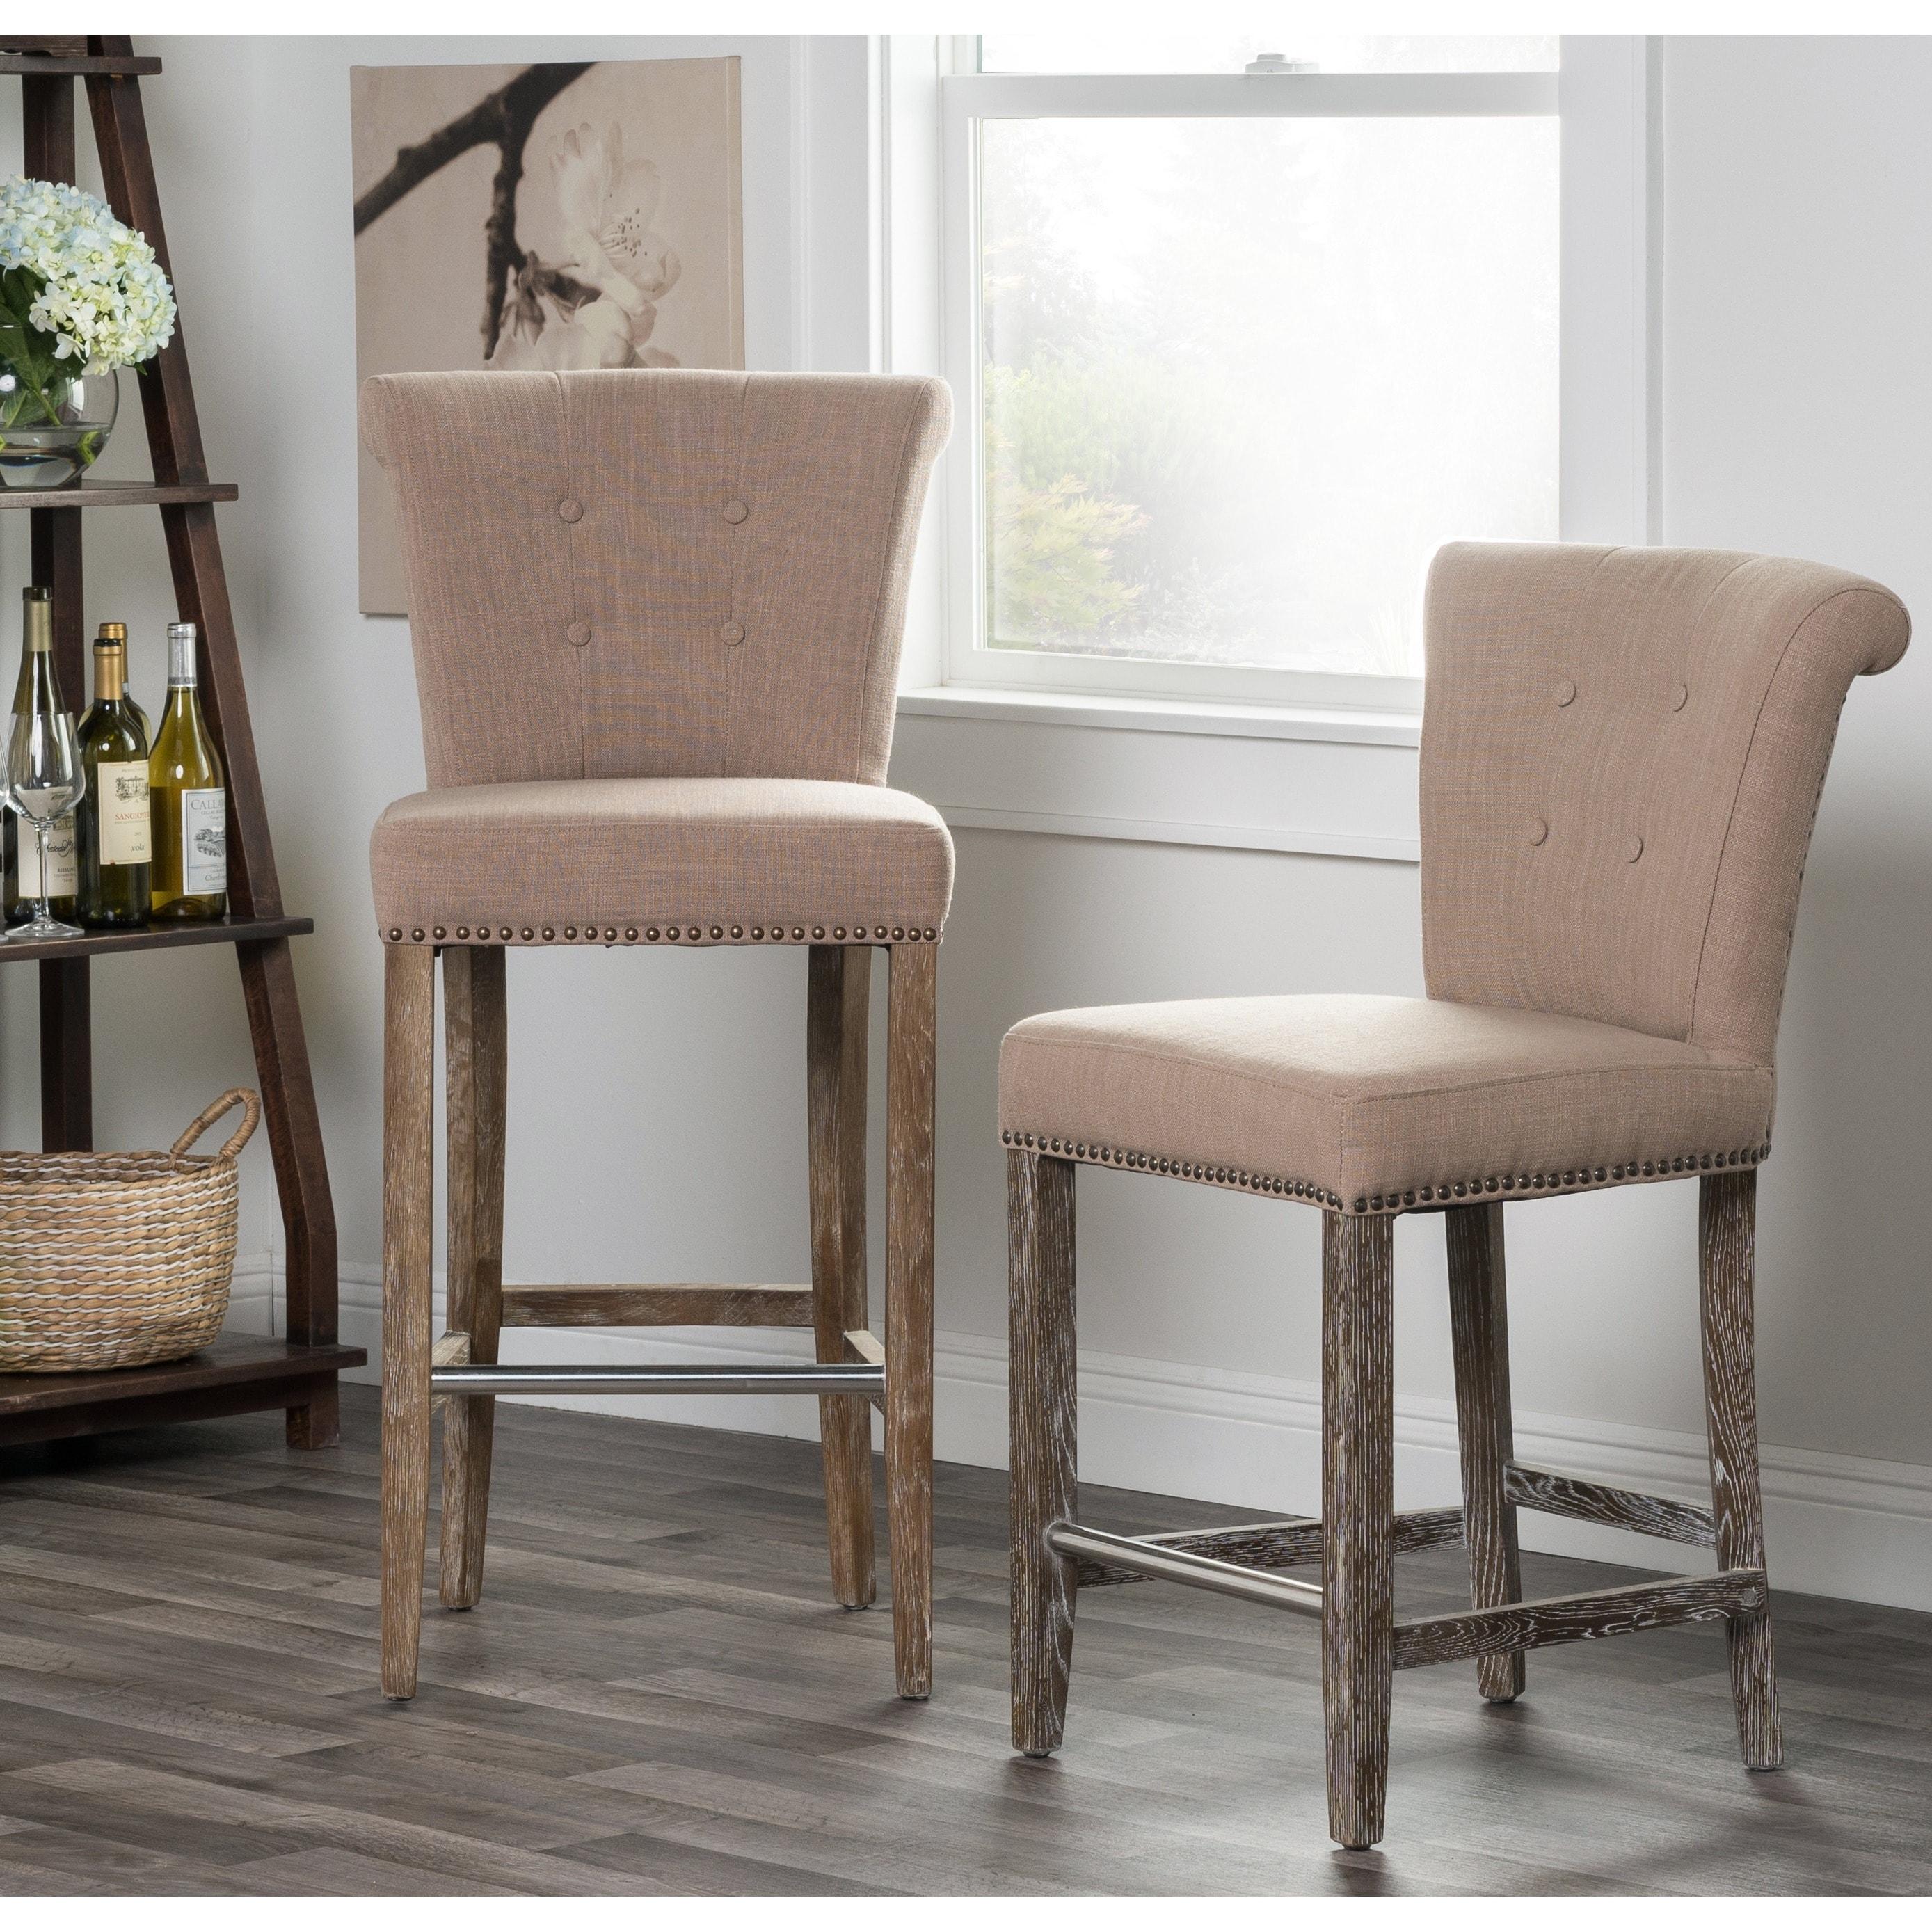 Rafa Grey Upholstered 30 Inch Barstool By Kosas Home Free Shipping Today 7649709